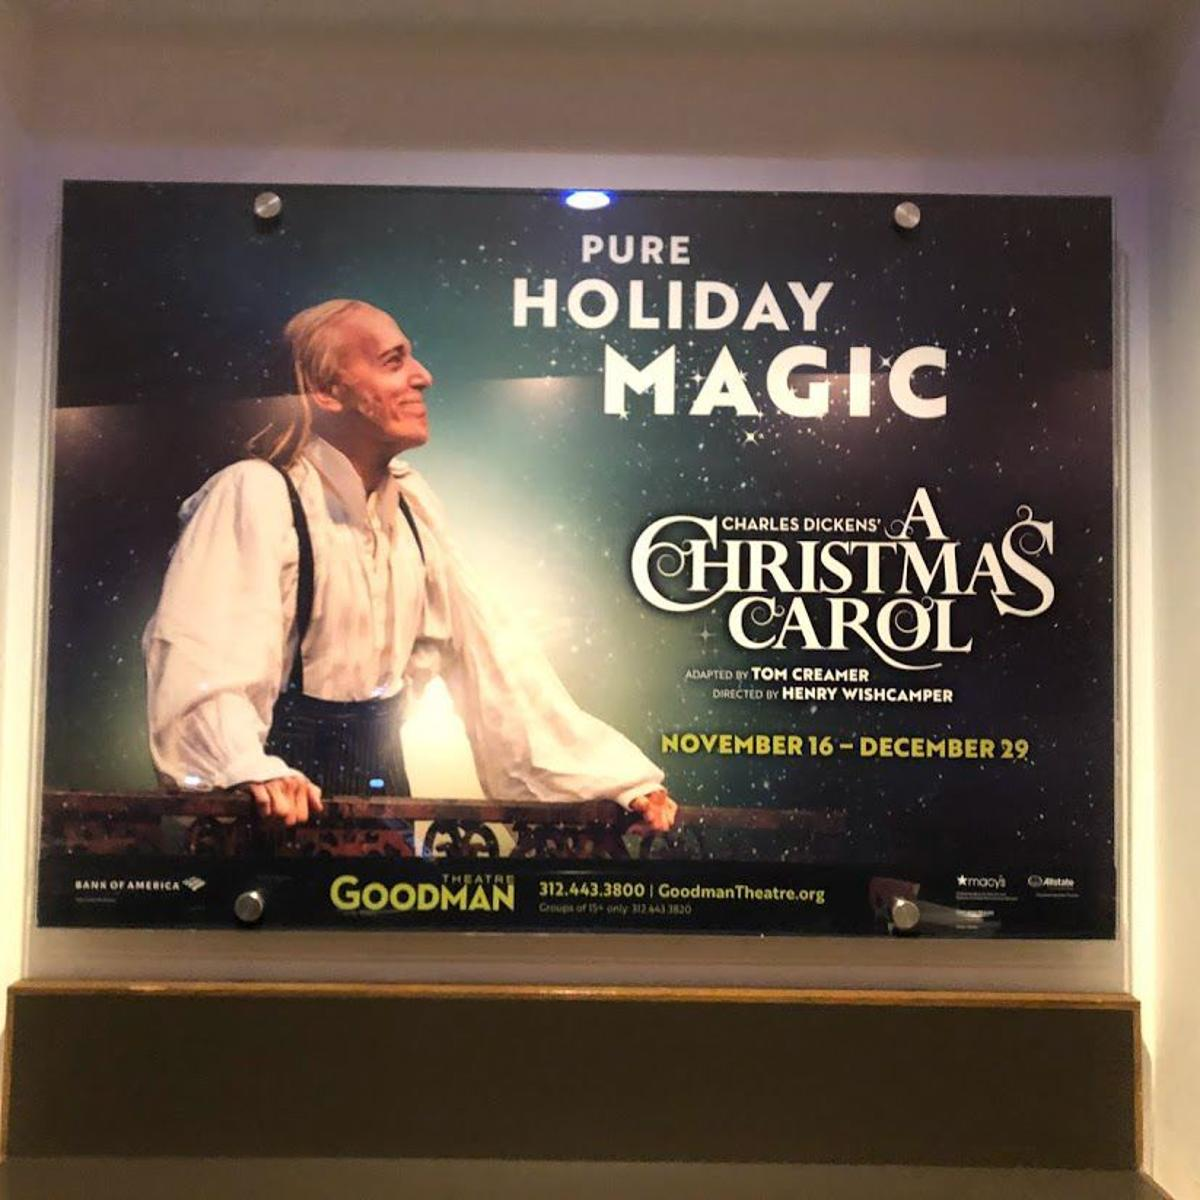 A Christmas Carol Chicago 2021 Goodman S Gift To Public Free Audio Version Of A Christmas Carol Entertainment Nwitimes Com